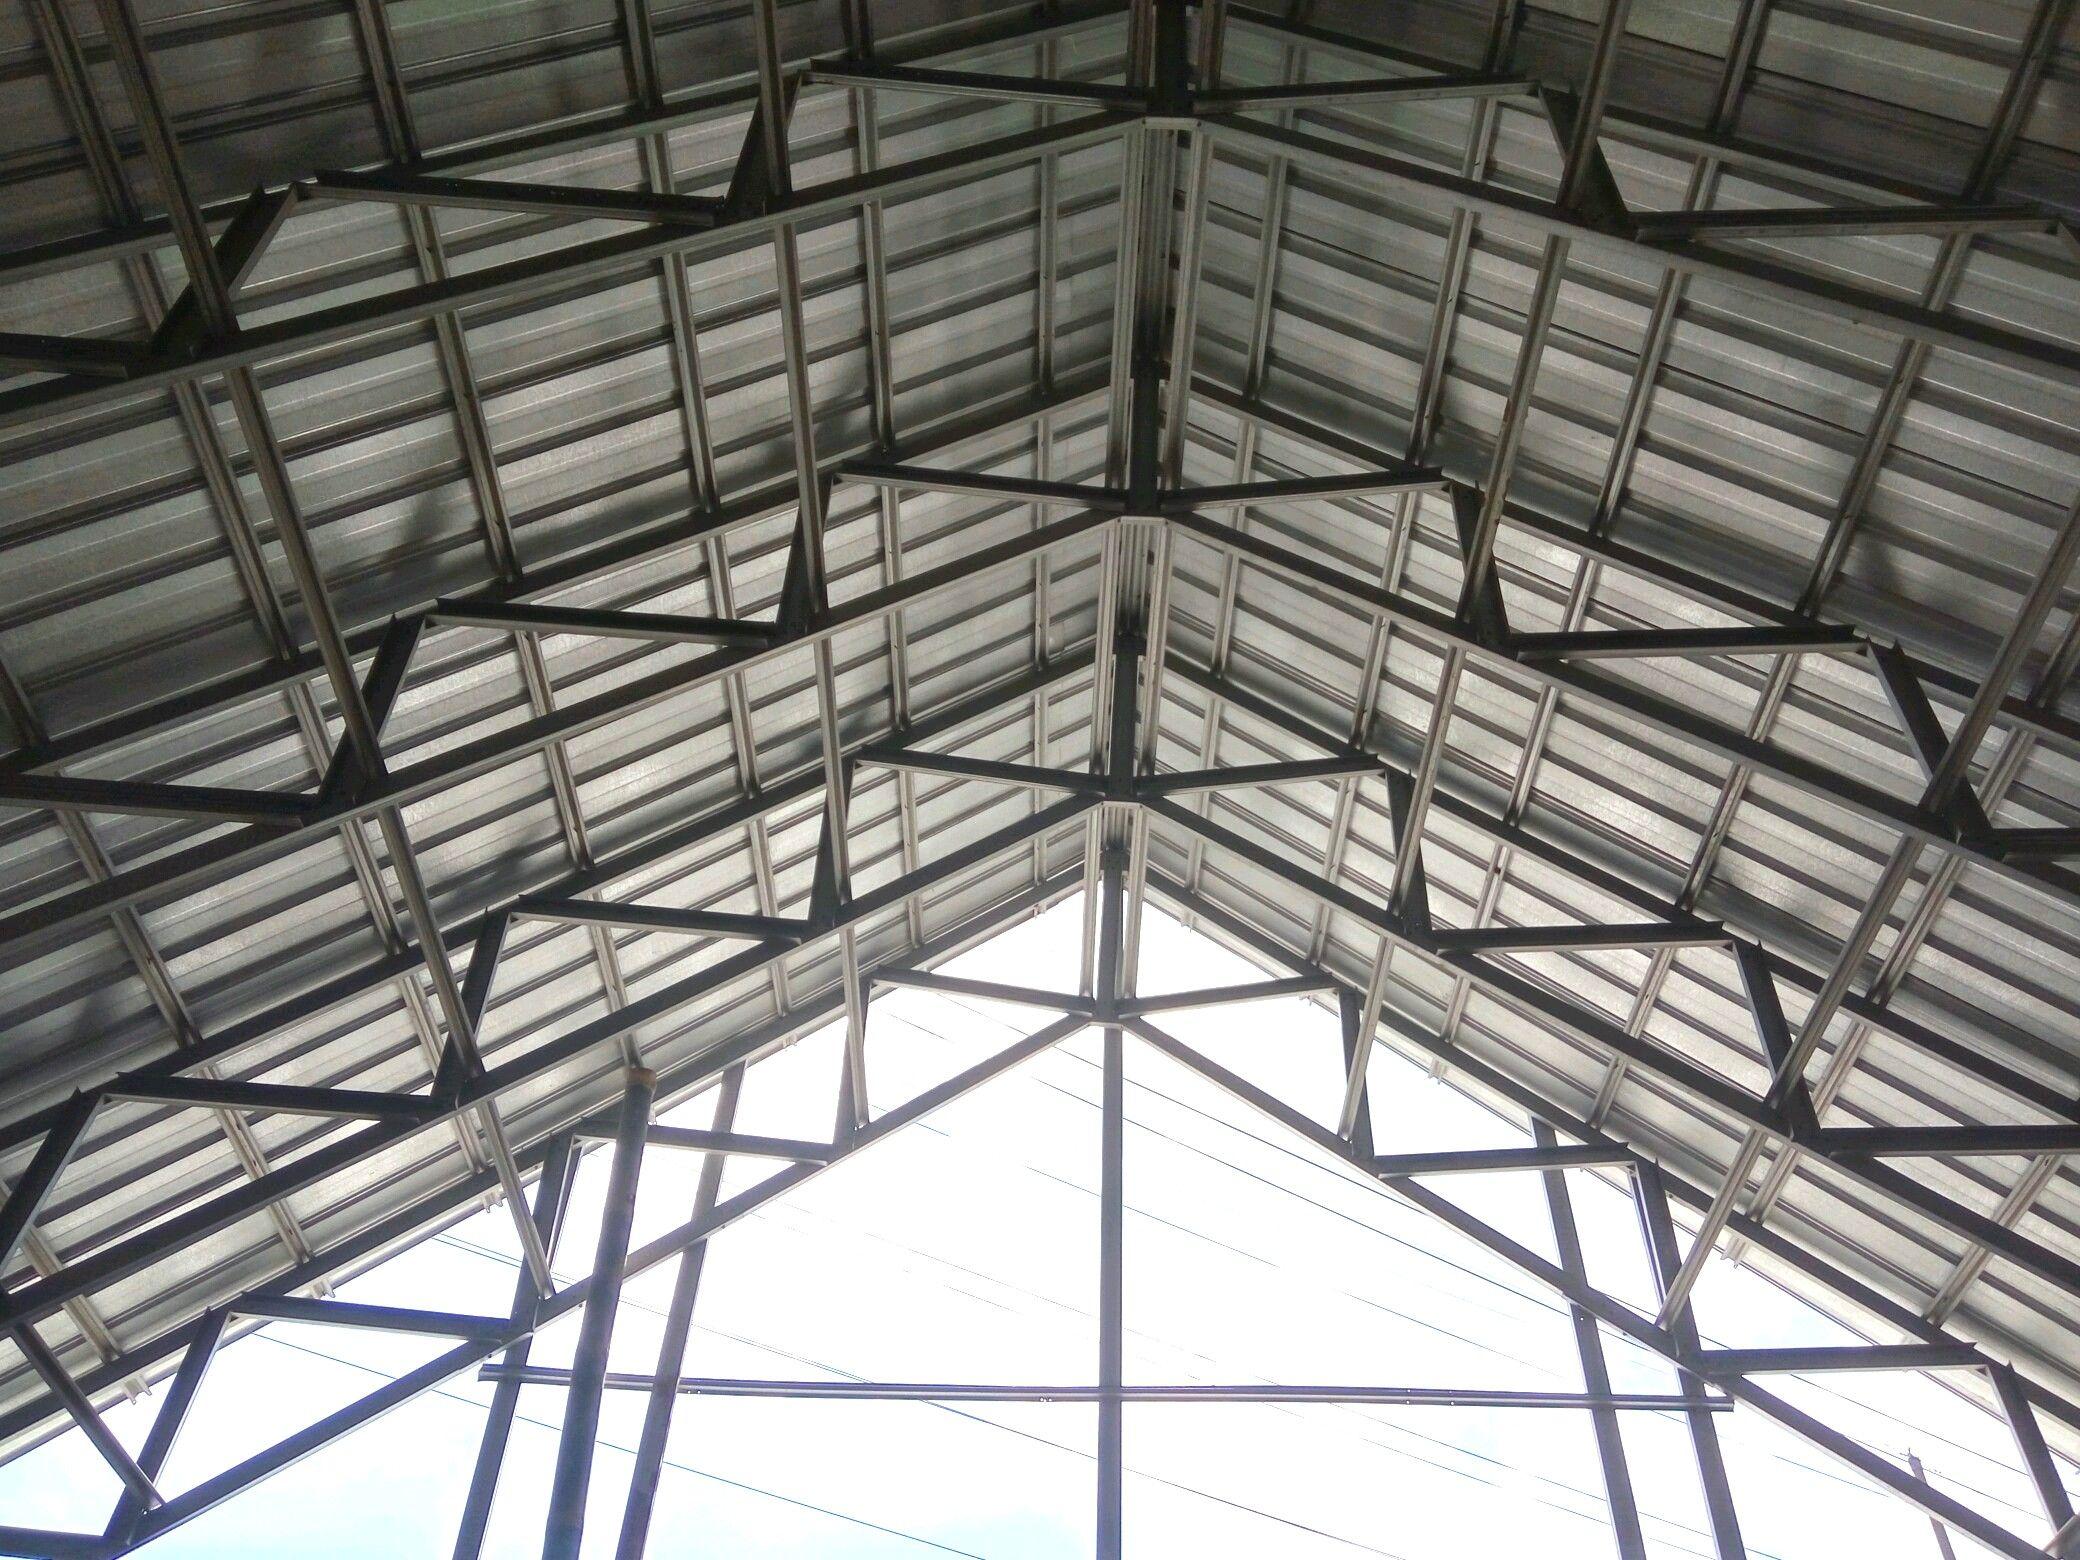 harga rangka atap baja ringan advertising balikpapan jasa produksi neon box toko